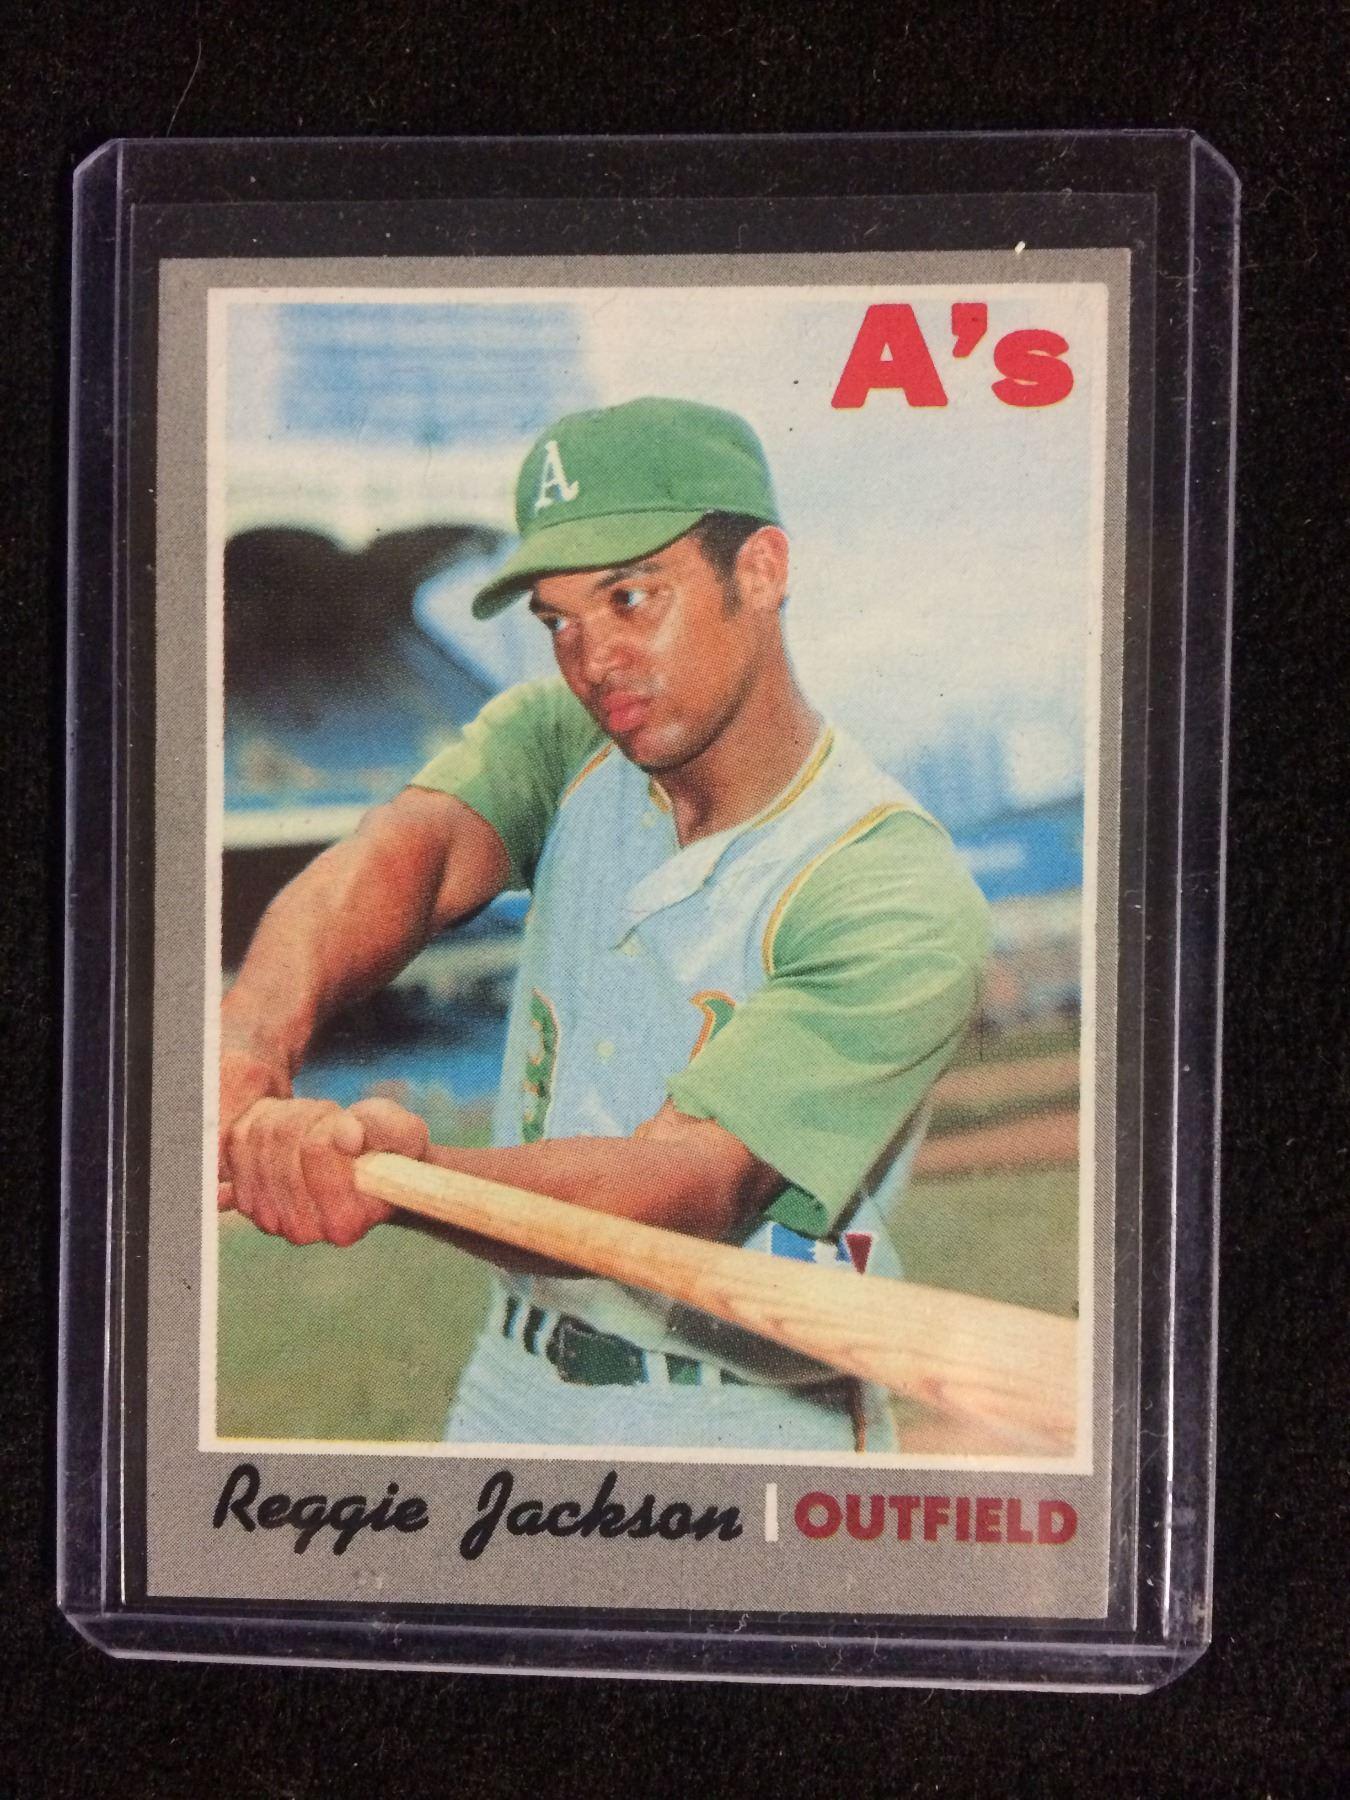 1970 Topps Reggie Jackson Oakland Athletics 140 Baseball Card